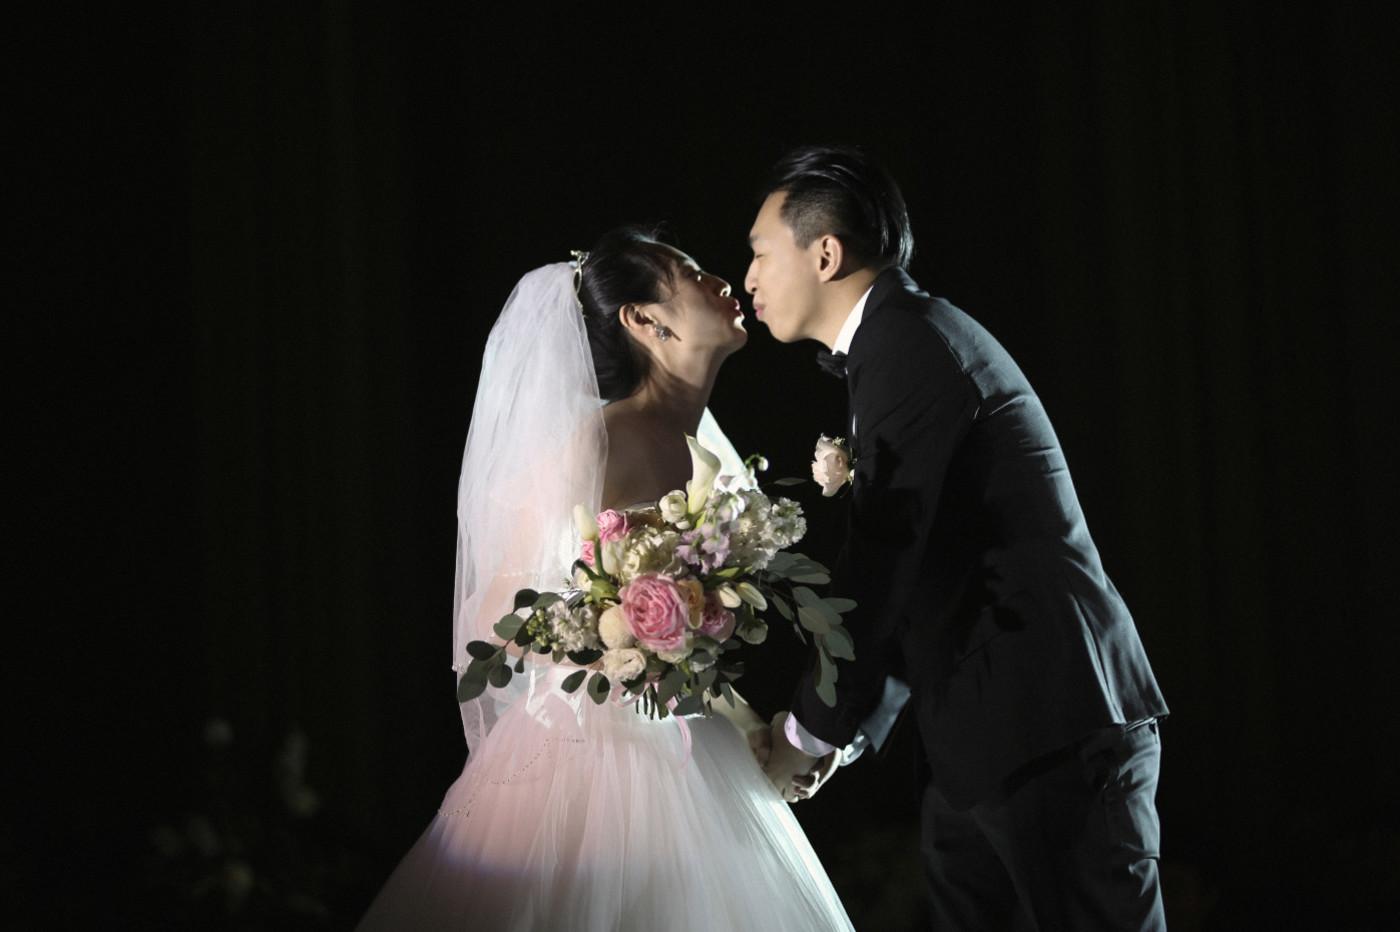 【KAI 婚礼纪实】Z&Y 常州婚礼42